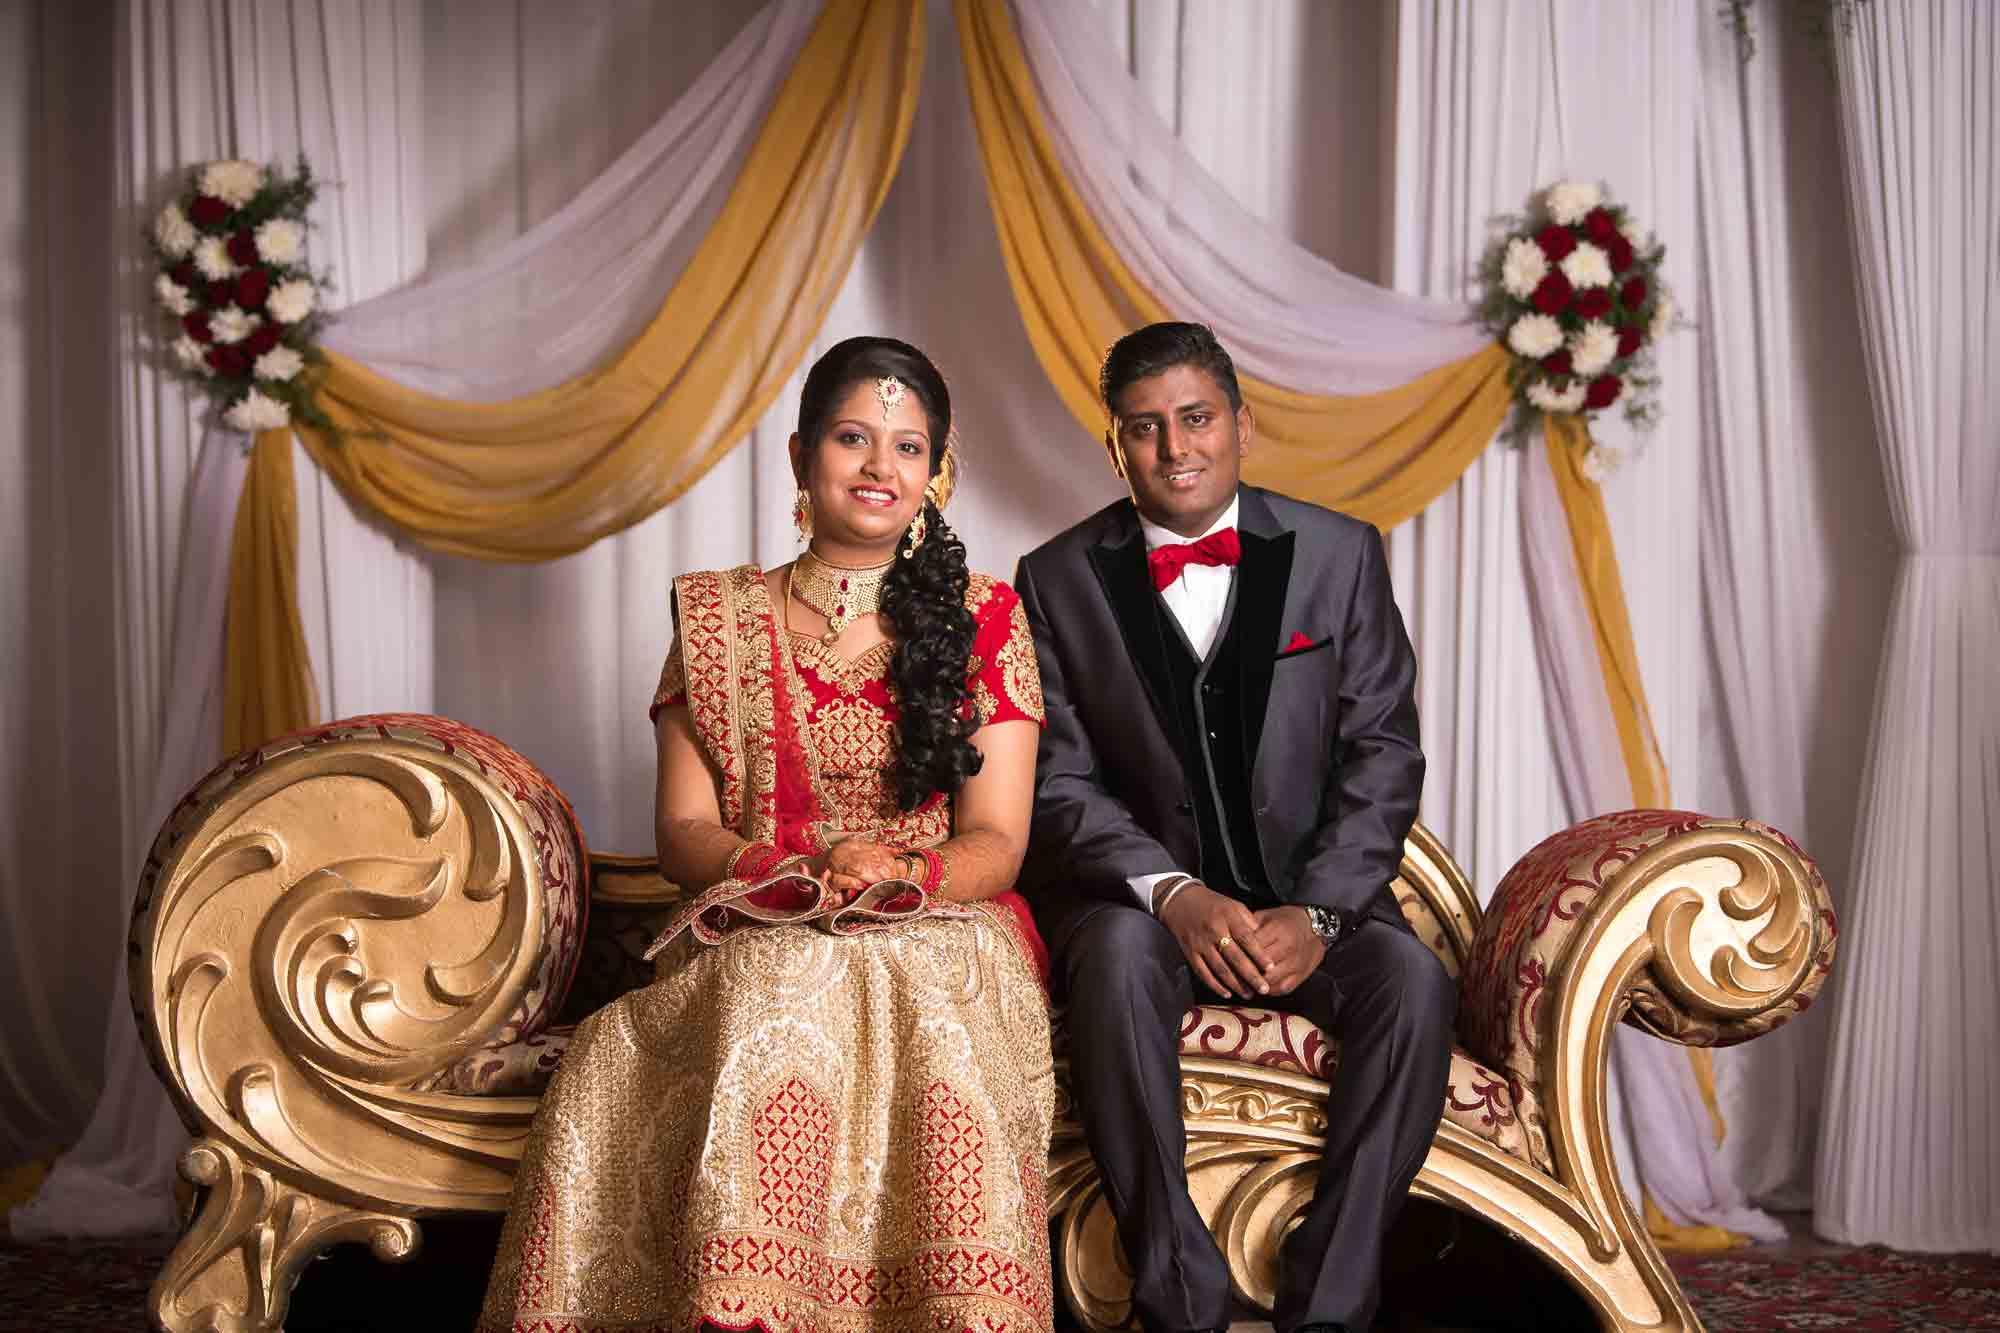 Bindhya & Shirdhar